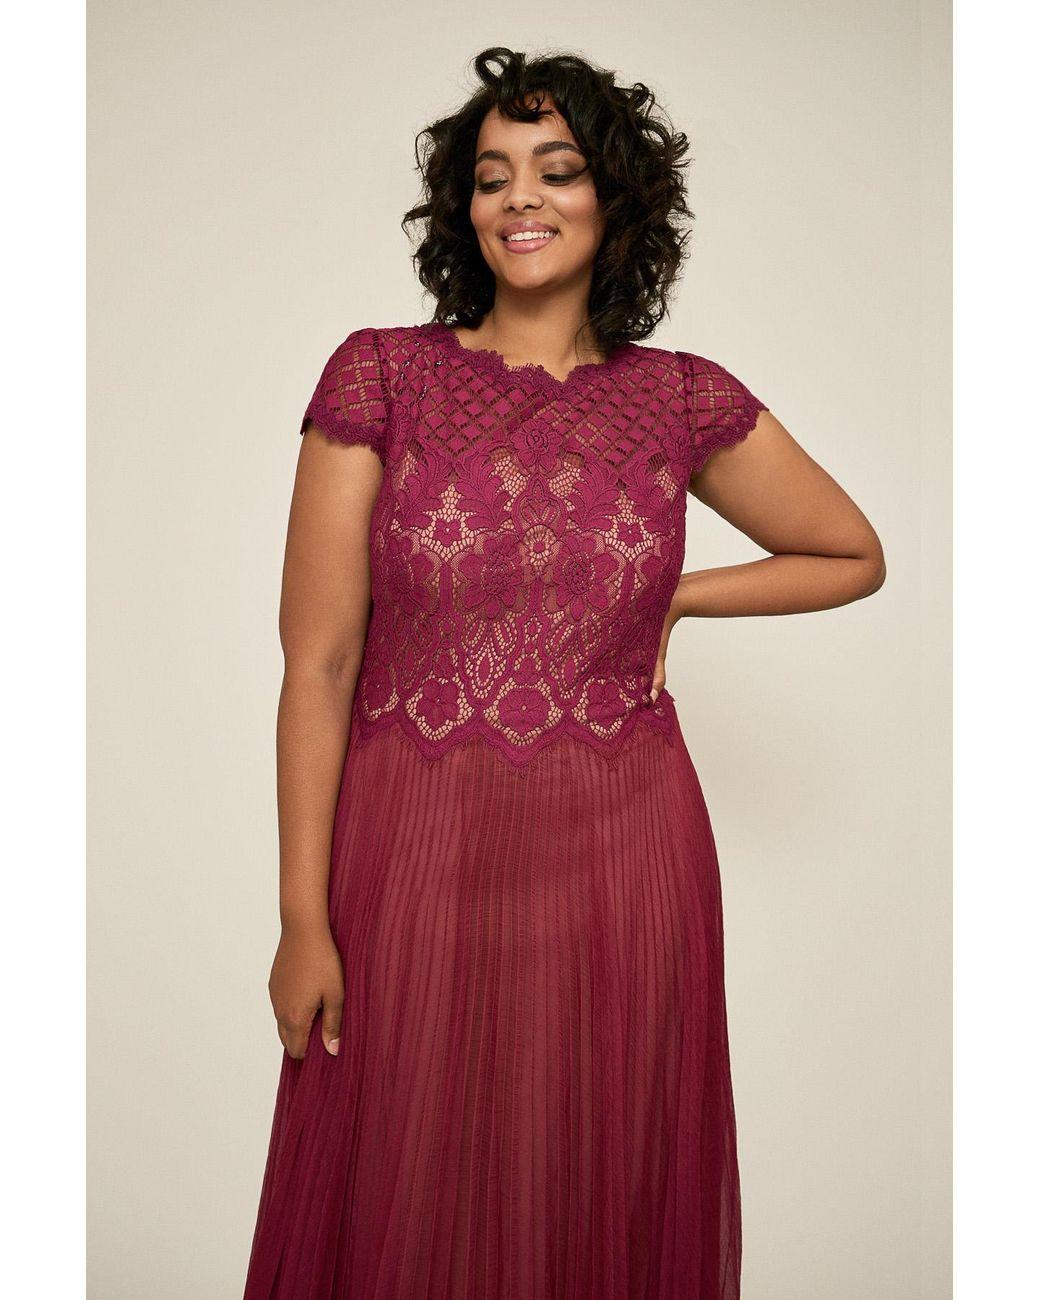 Drusa Chiffon Lace Tea-length Dress - Plus Size